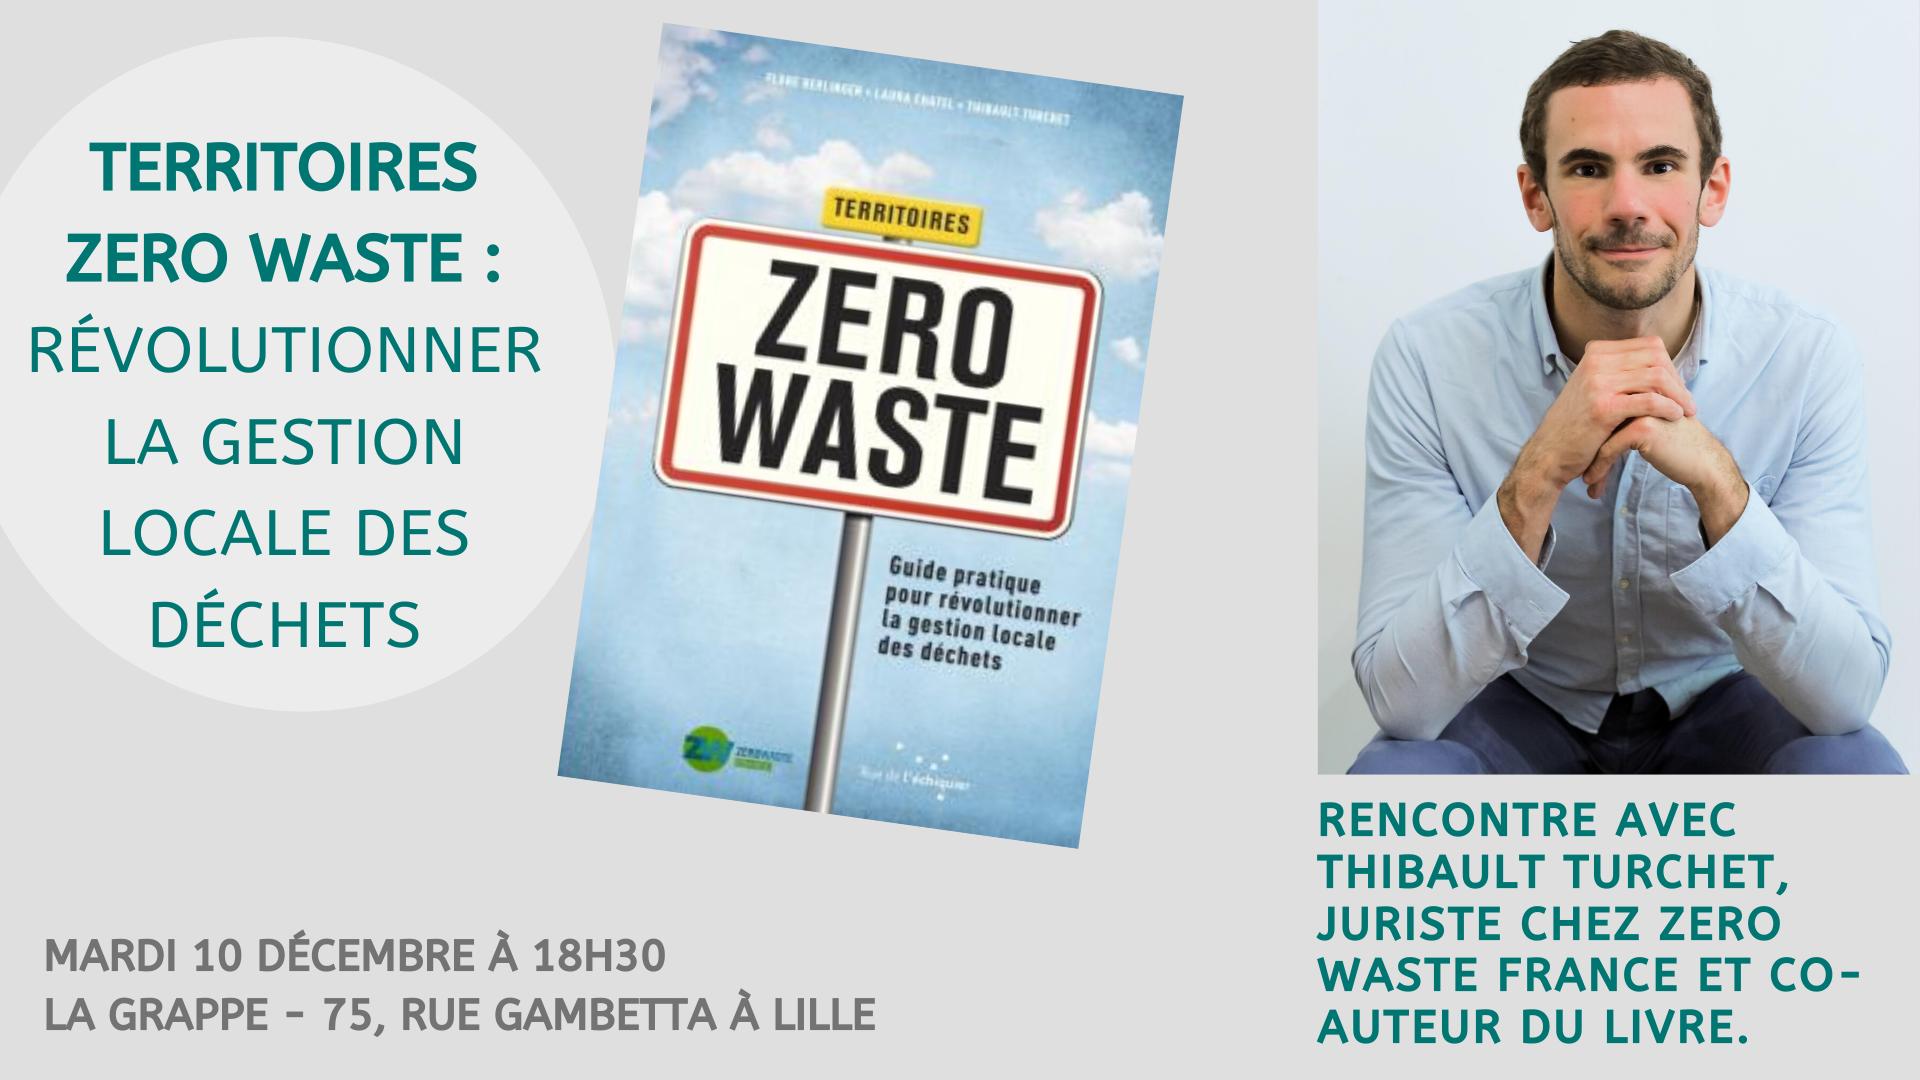 Territoires Zero Waste - Formation citoyenne avec T. Turchet